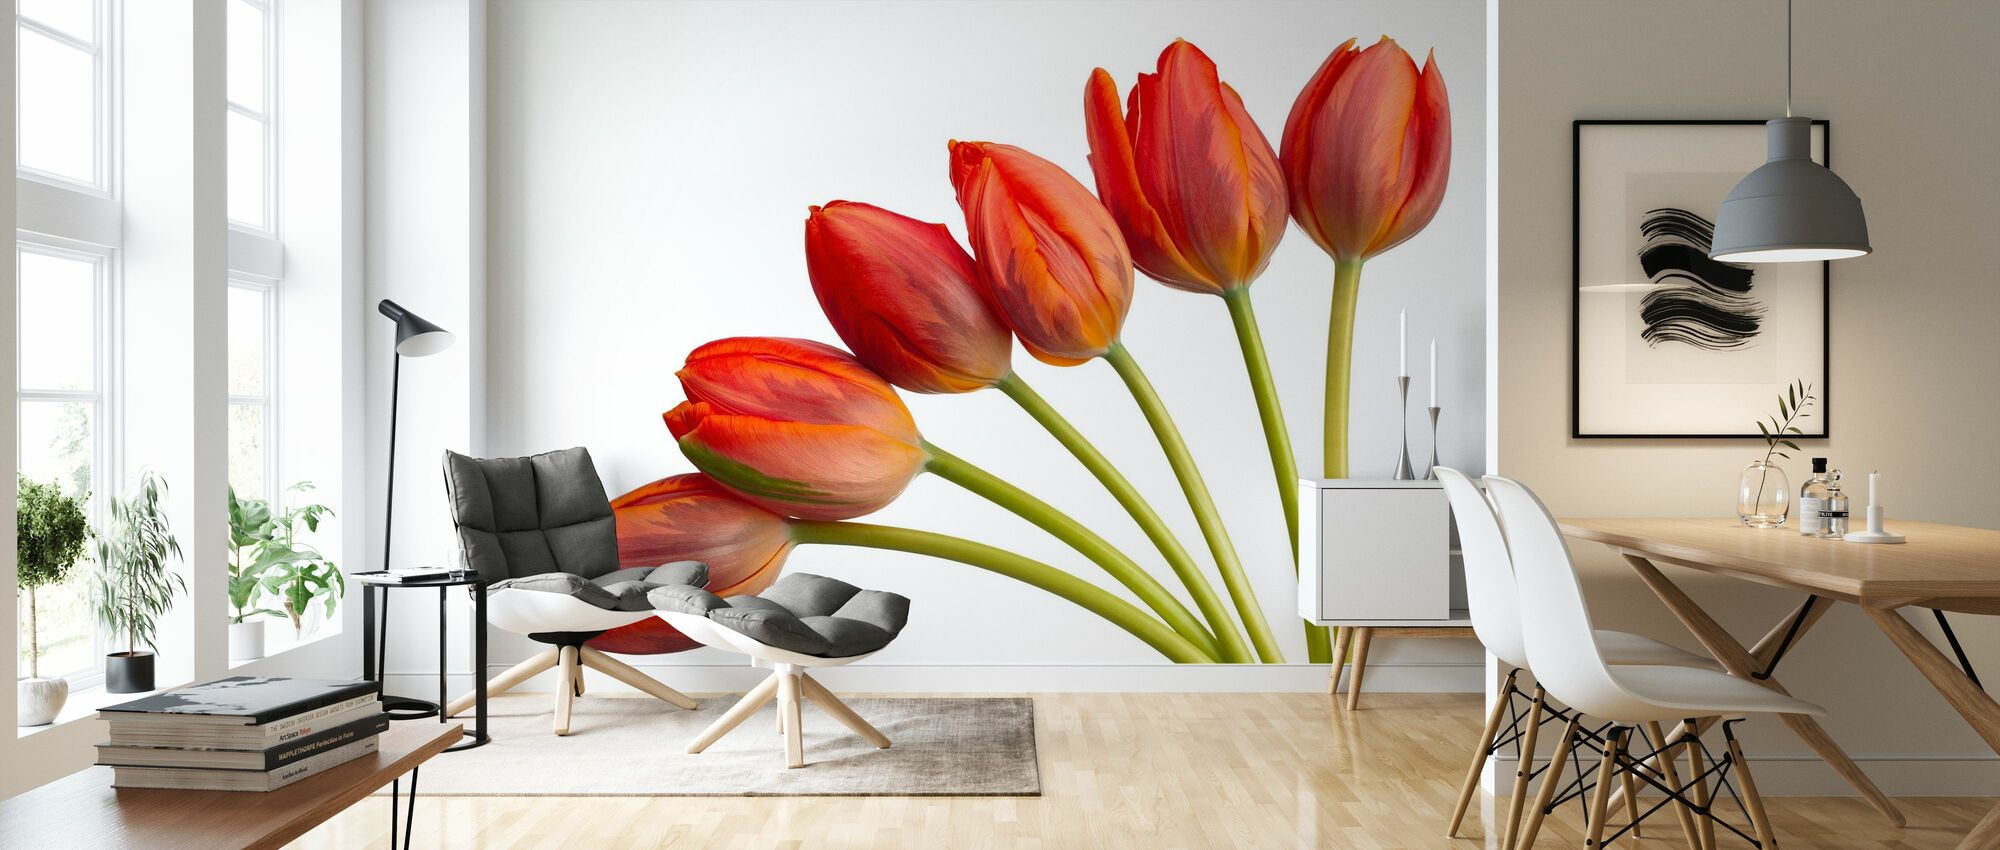 Tulpen - Behang - Woonkamer